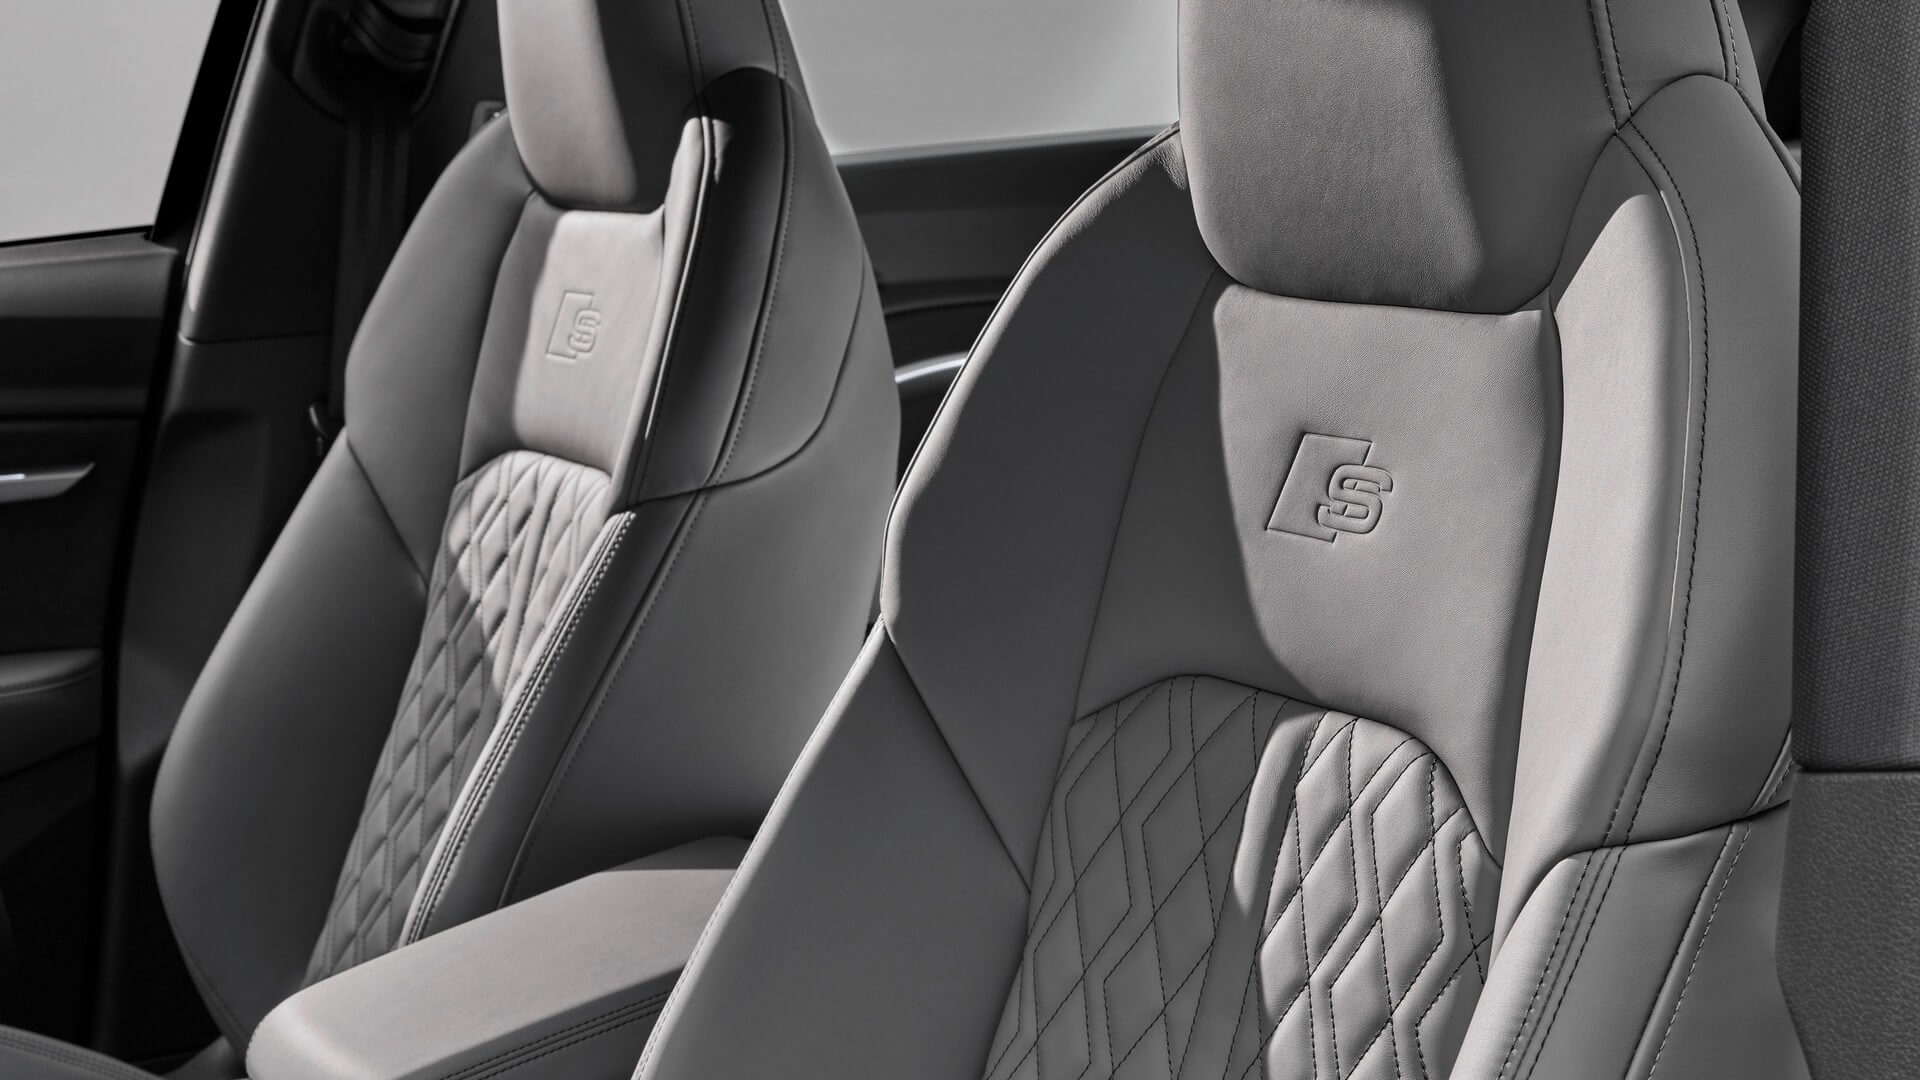 Audi-E-Tron-S-and-E-Tron-S-Sportback-2020-109